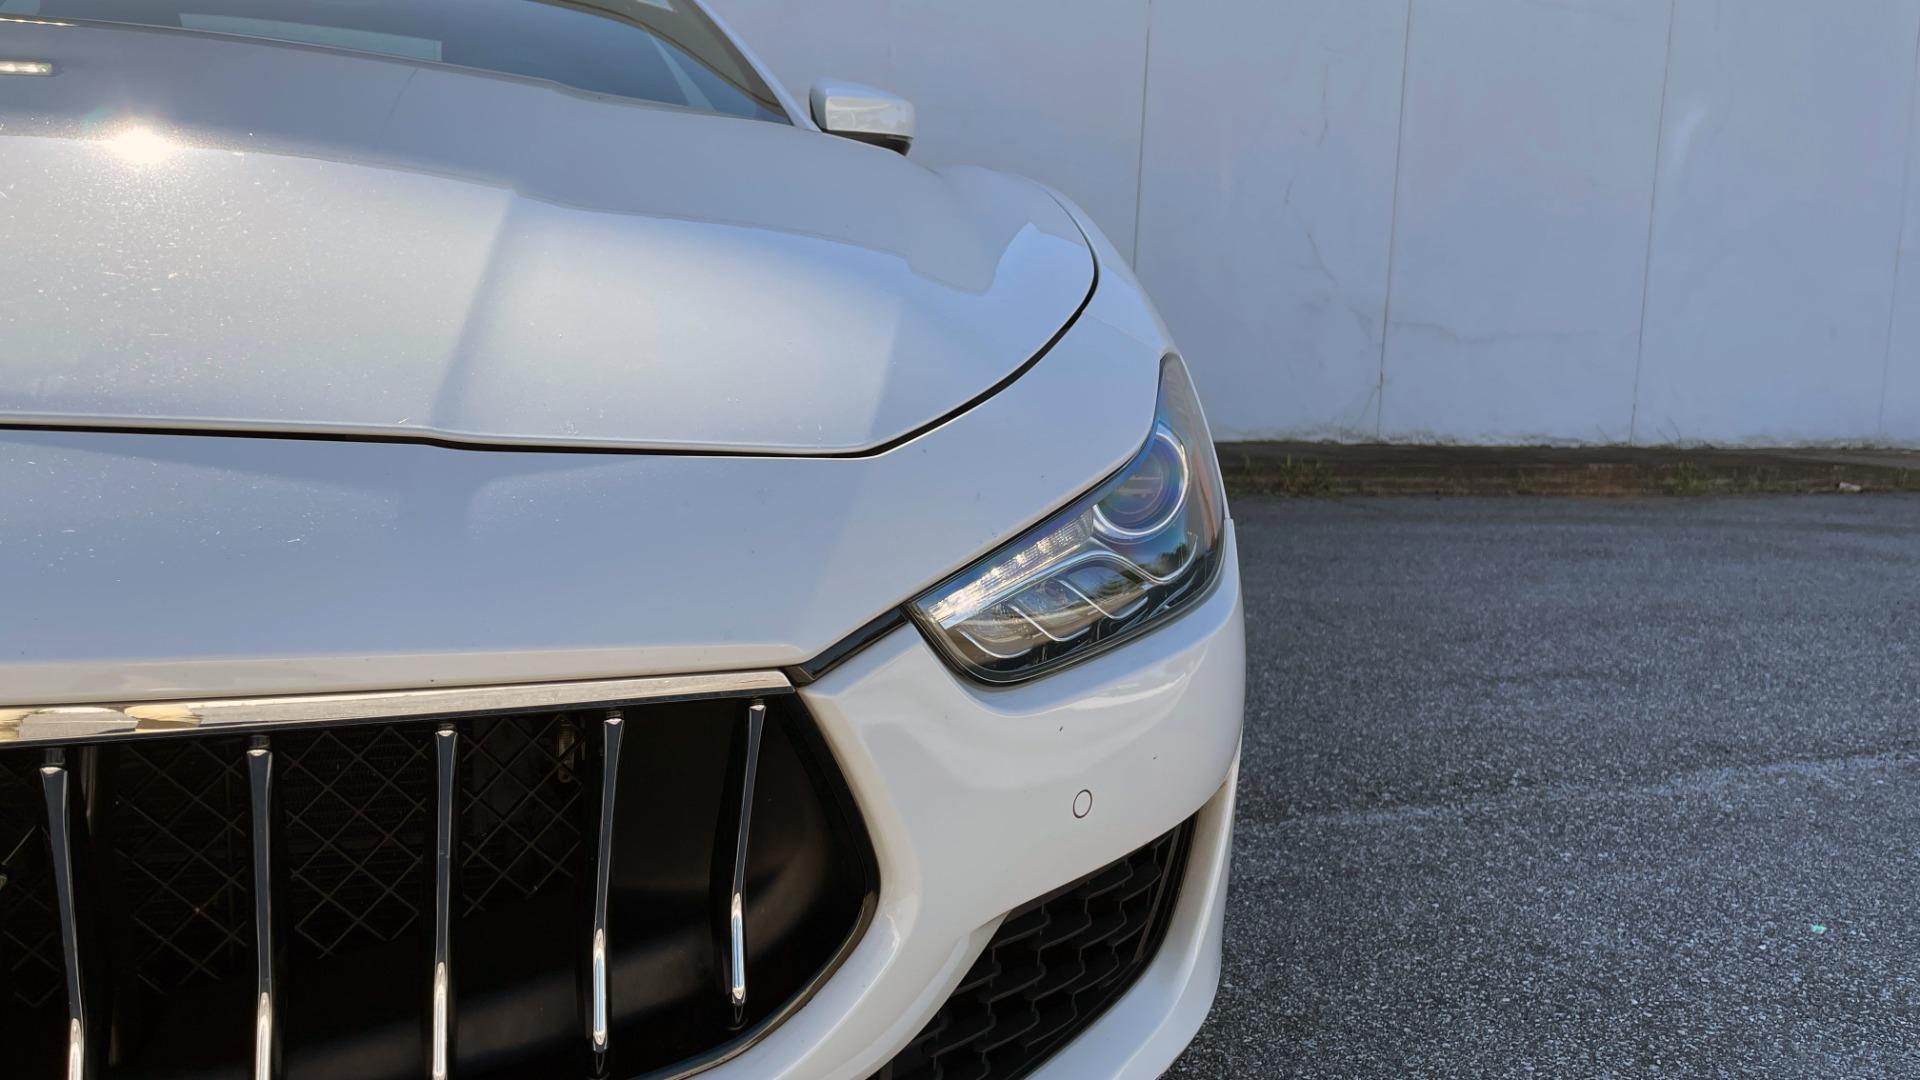 Used 2018 Maserati GHIBLI SEDAN / RWD / 3.0L V6 / SUNROOF / NAV / REARVIEW for sale $42,995 at Formula Imports in Charlotte NC 28227 17